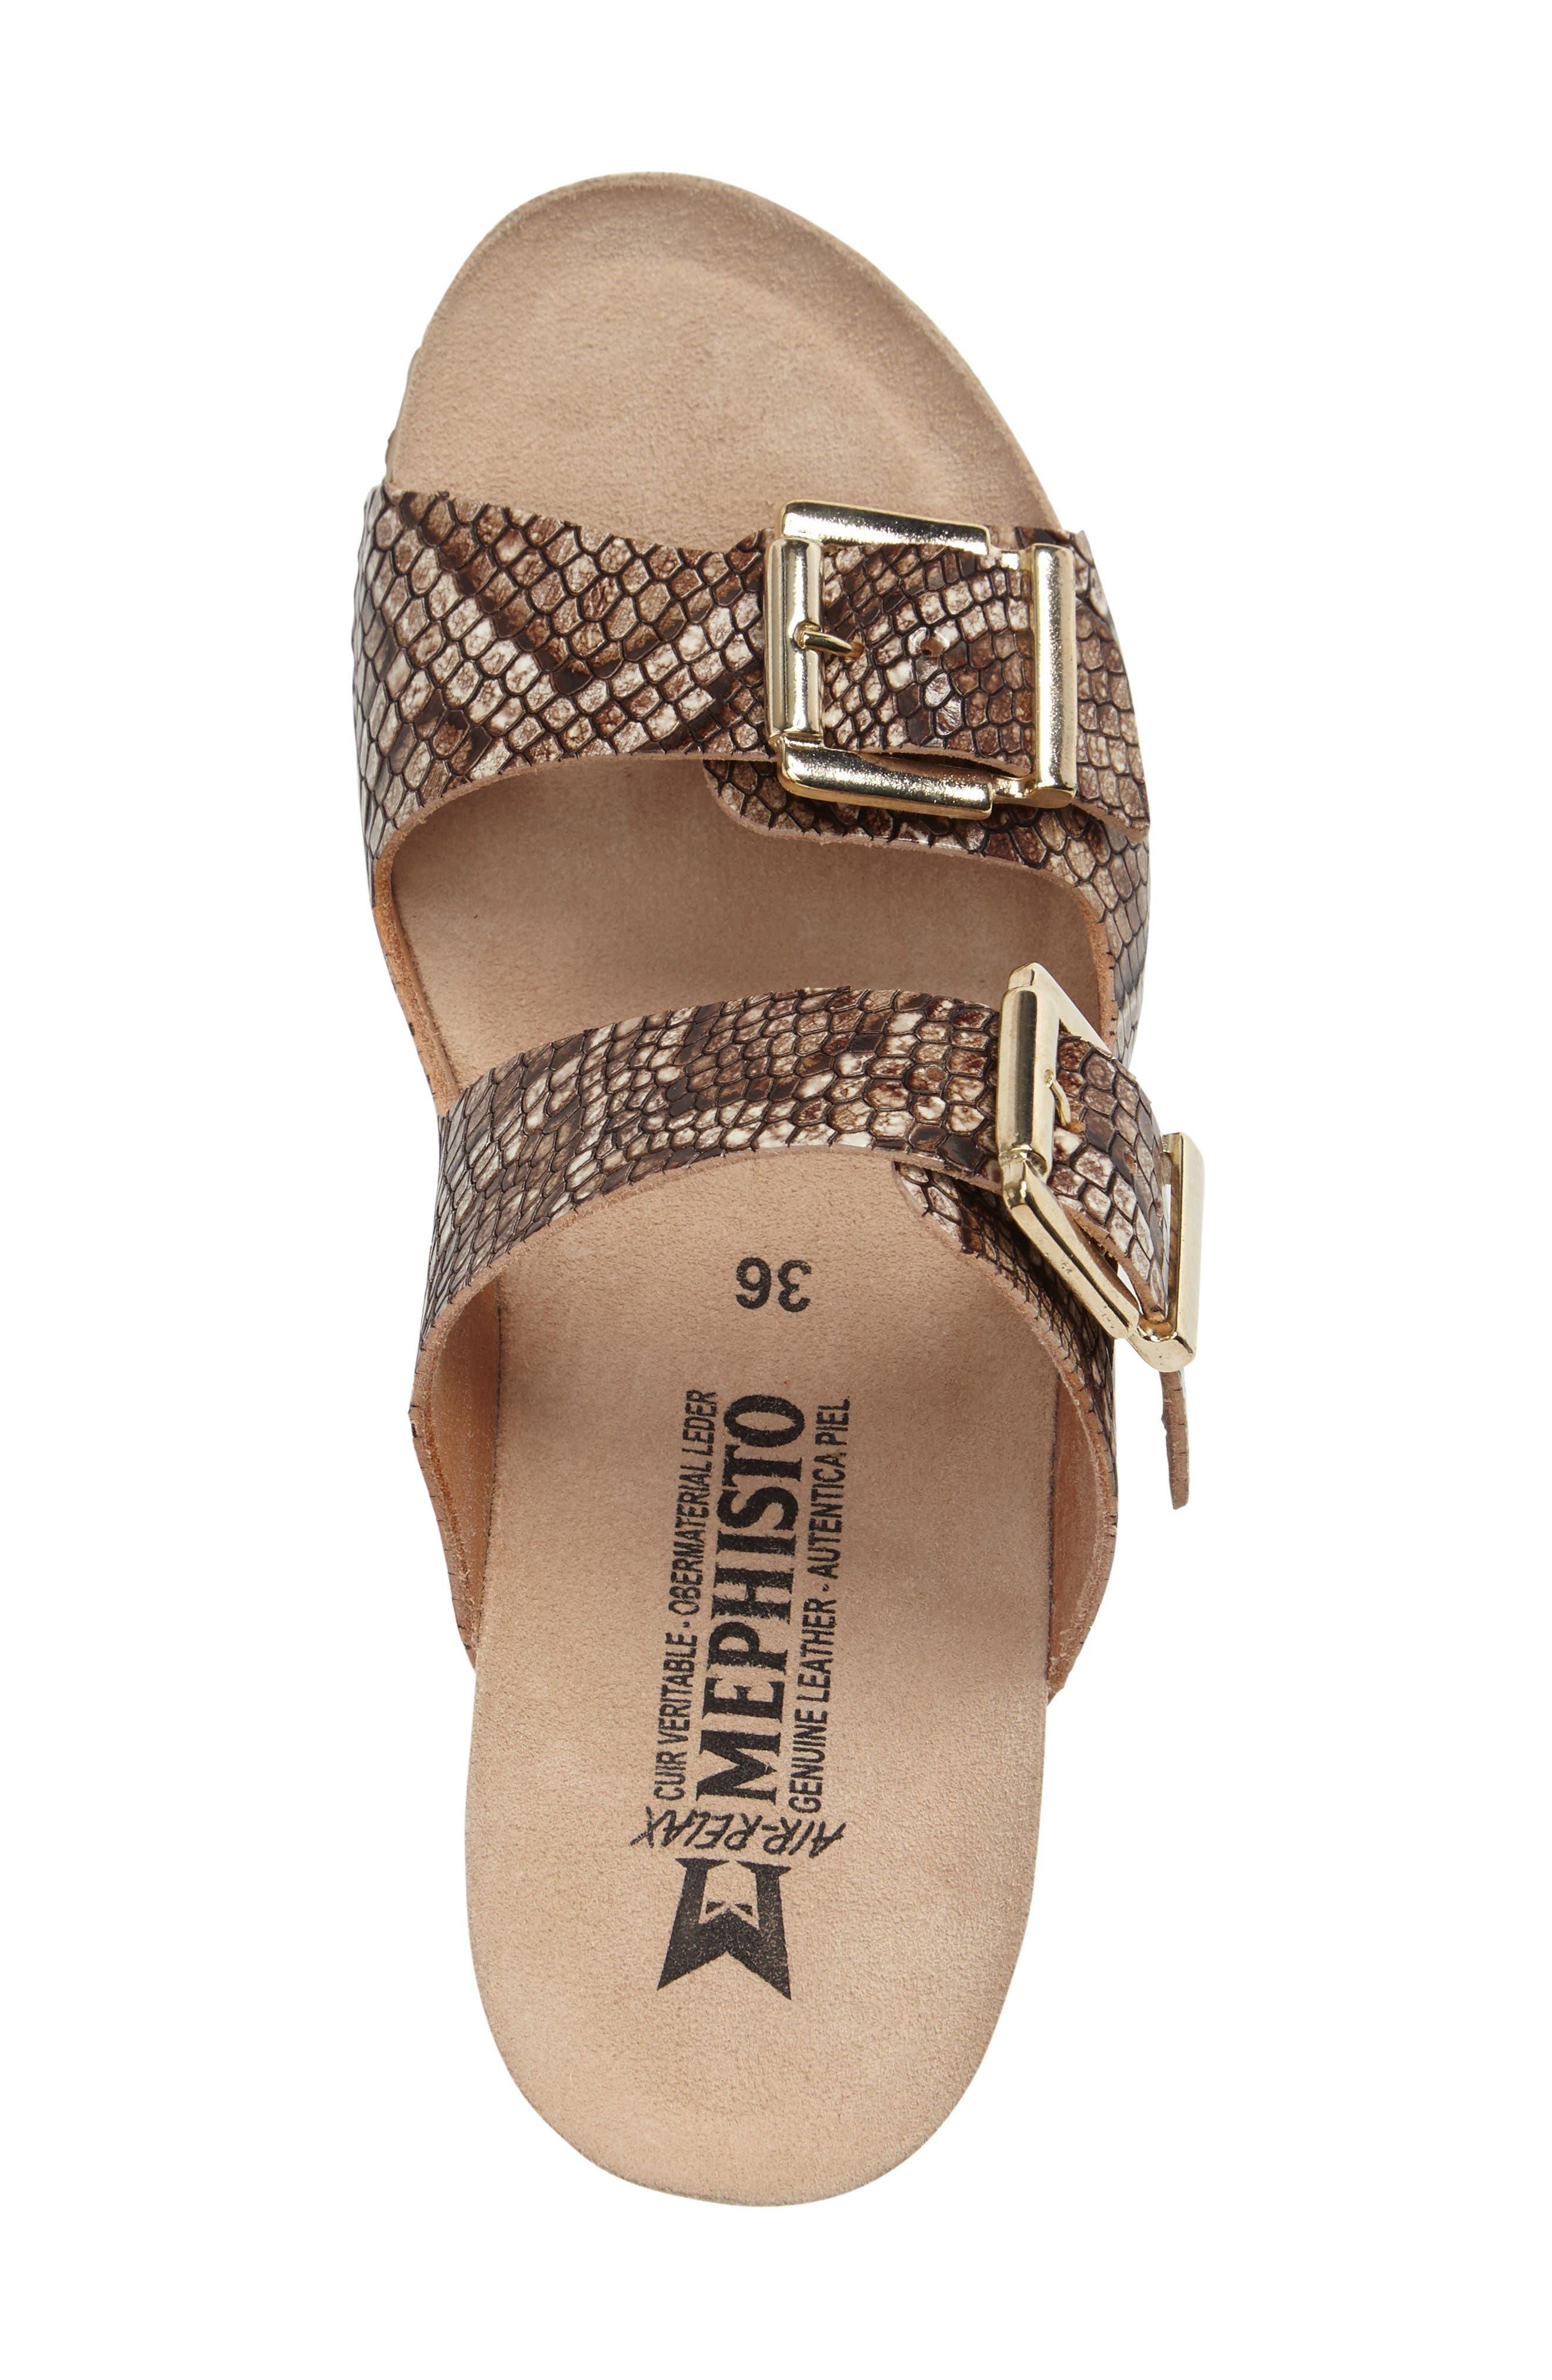 Lenia Wedge Sandal,                             Alternate thumbnail 3, color,                             Brown Leather